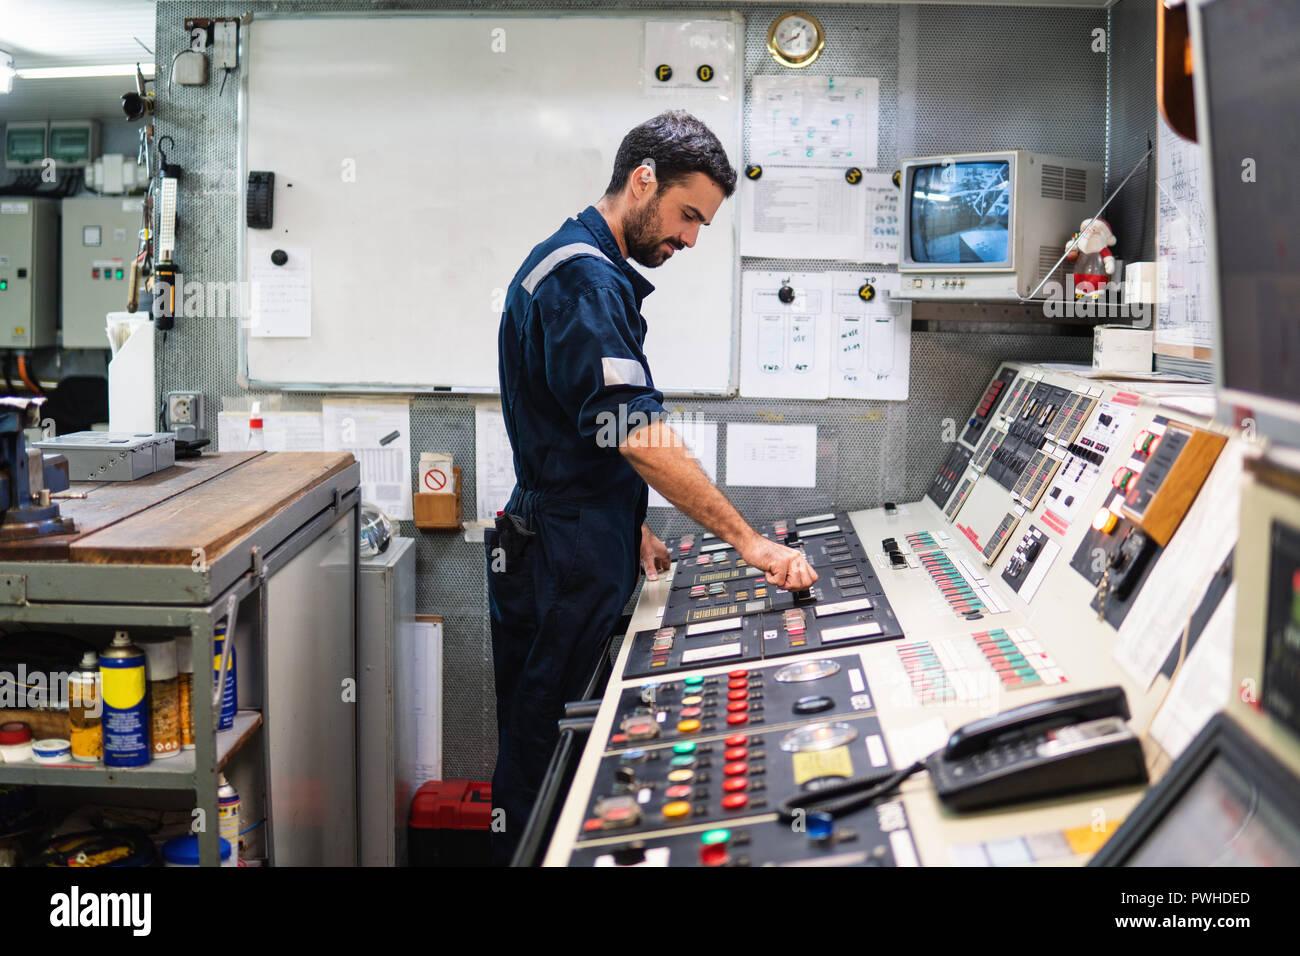 Marine engineer officer working in engine room - Stock Image